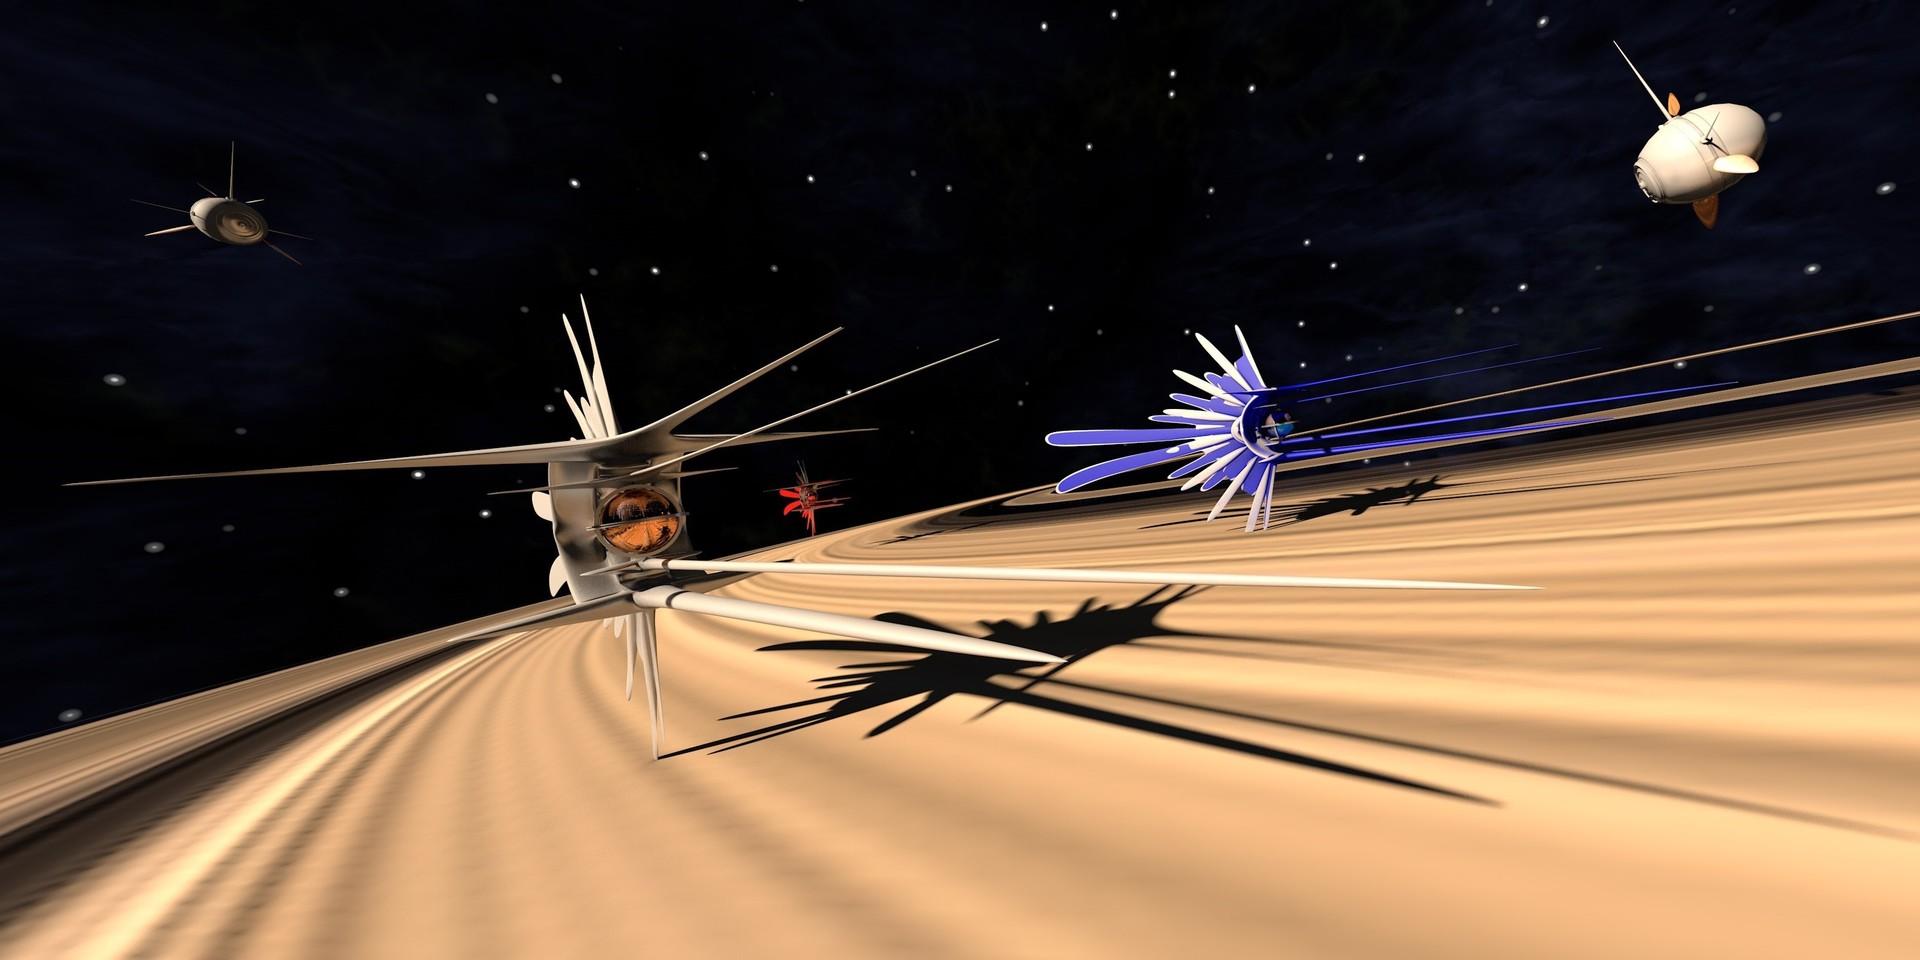 Dimitrije miljus aether ring race x